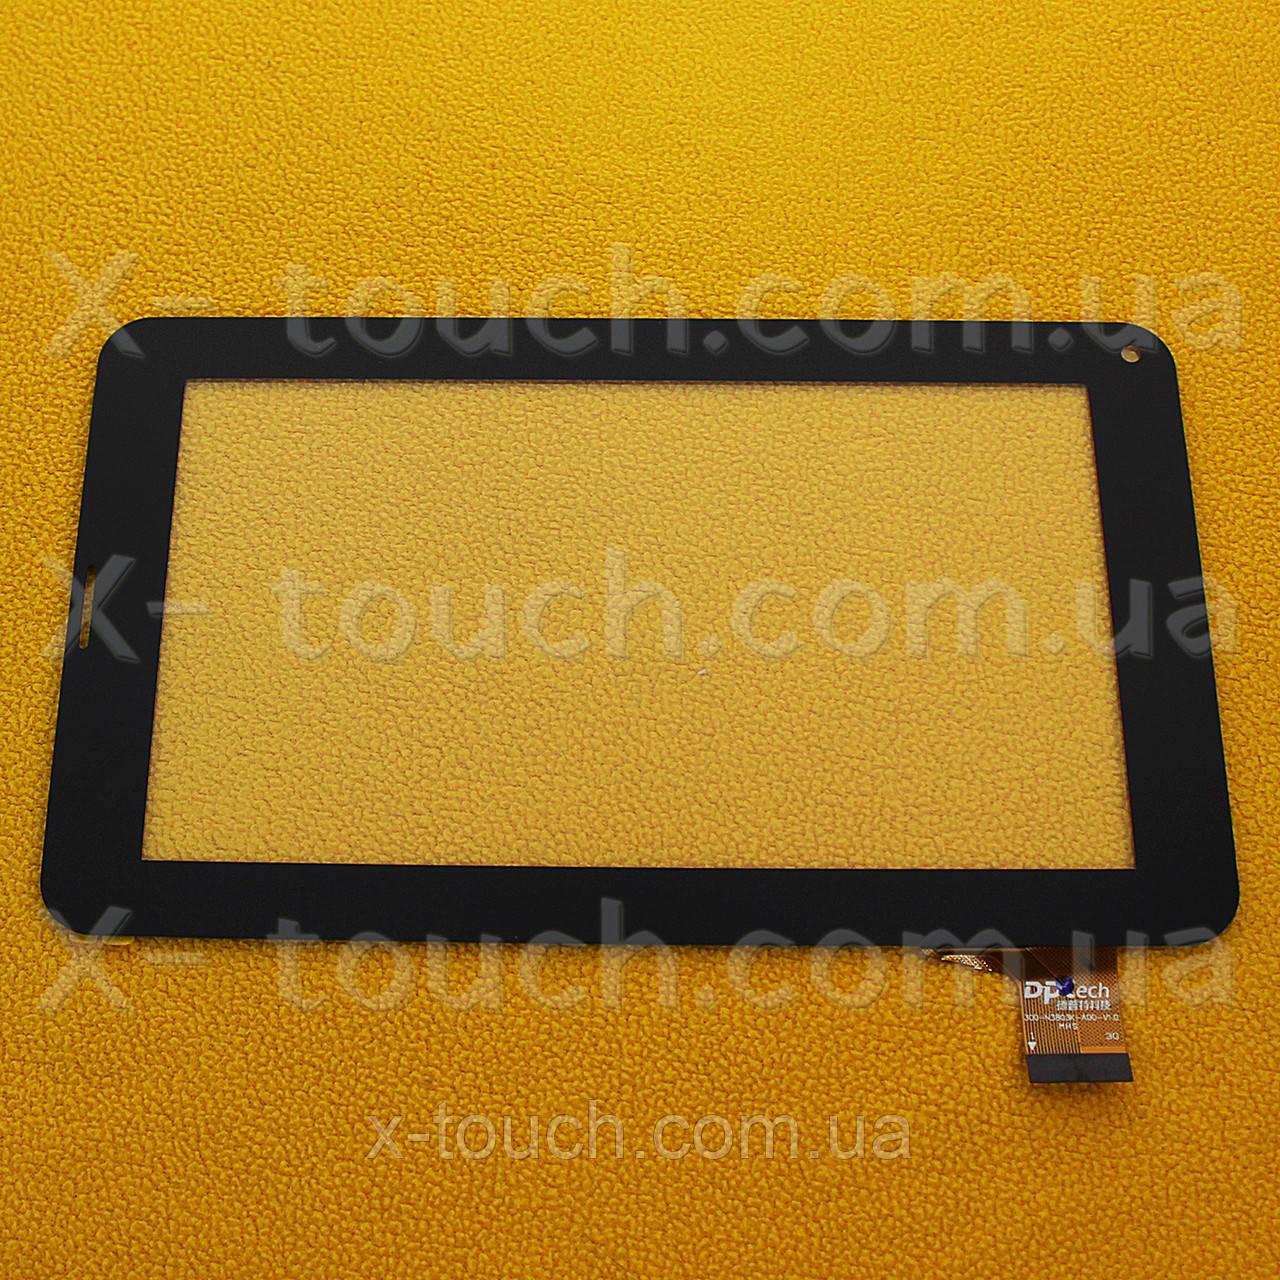 Тачскрин, сенсор BQ-7004 для планшета